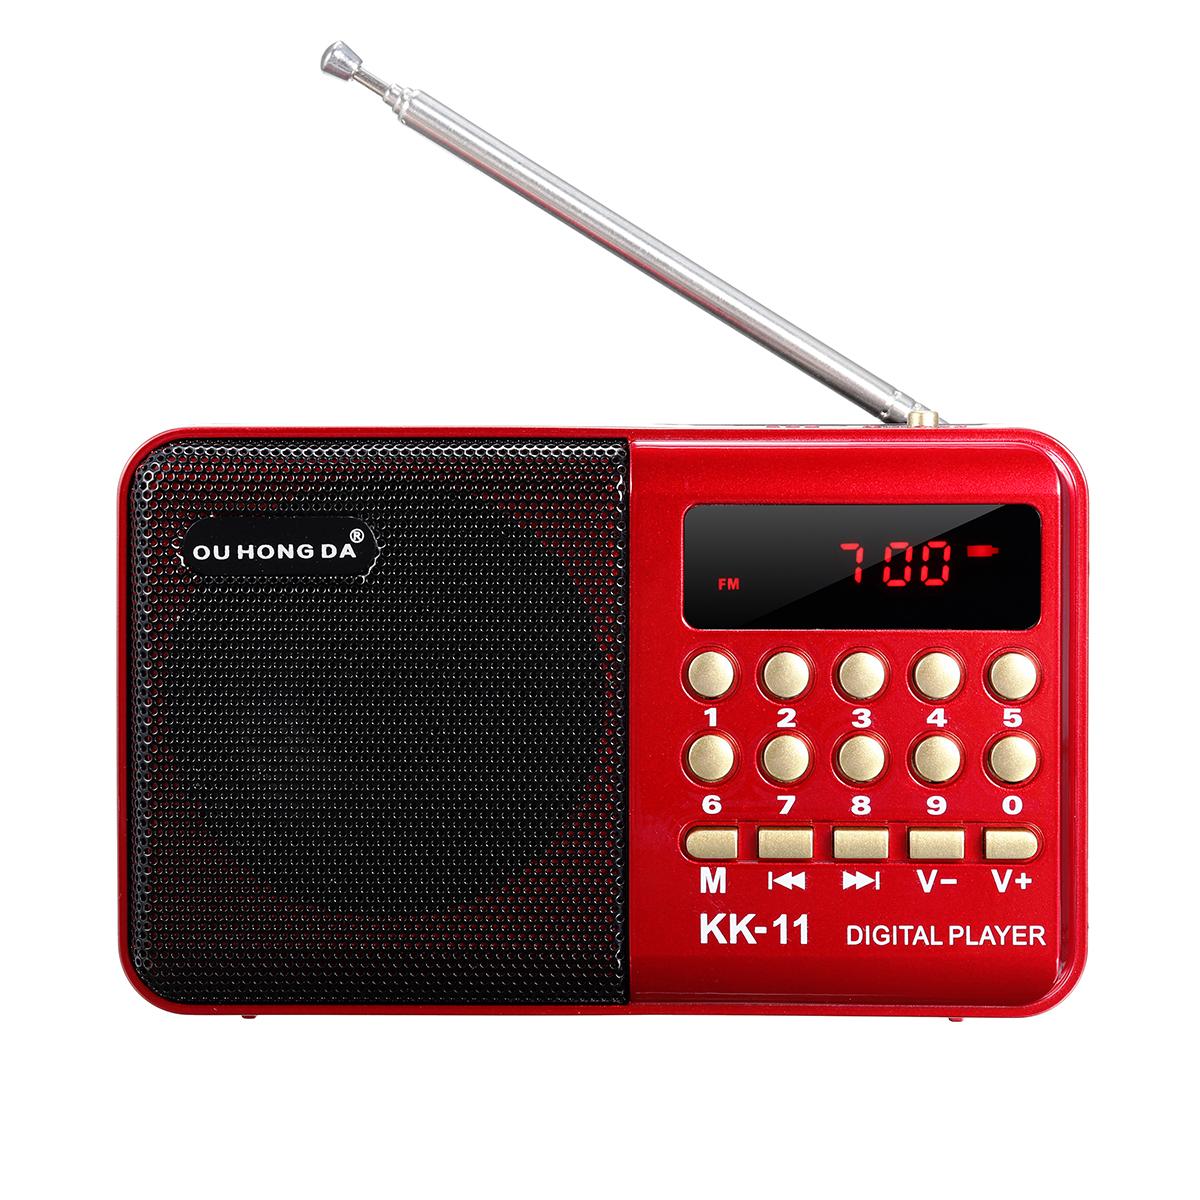 dc 5v 3w mini portable pocket lcd digital fm radio speaker. Black Bedroom Furniture Sets. Home Design Ideas